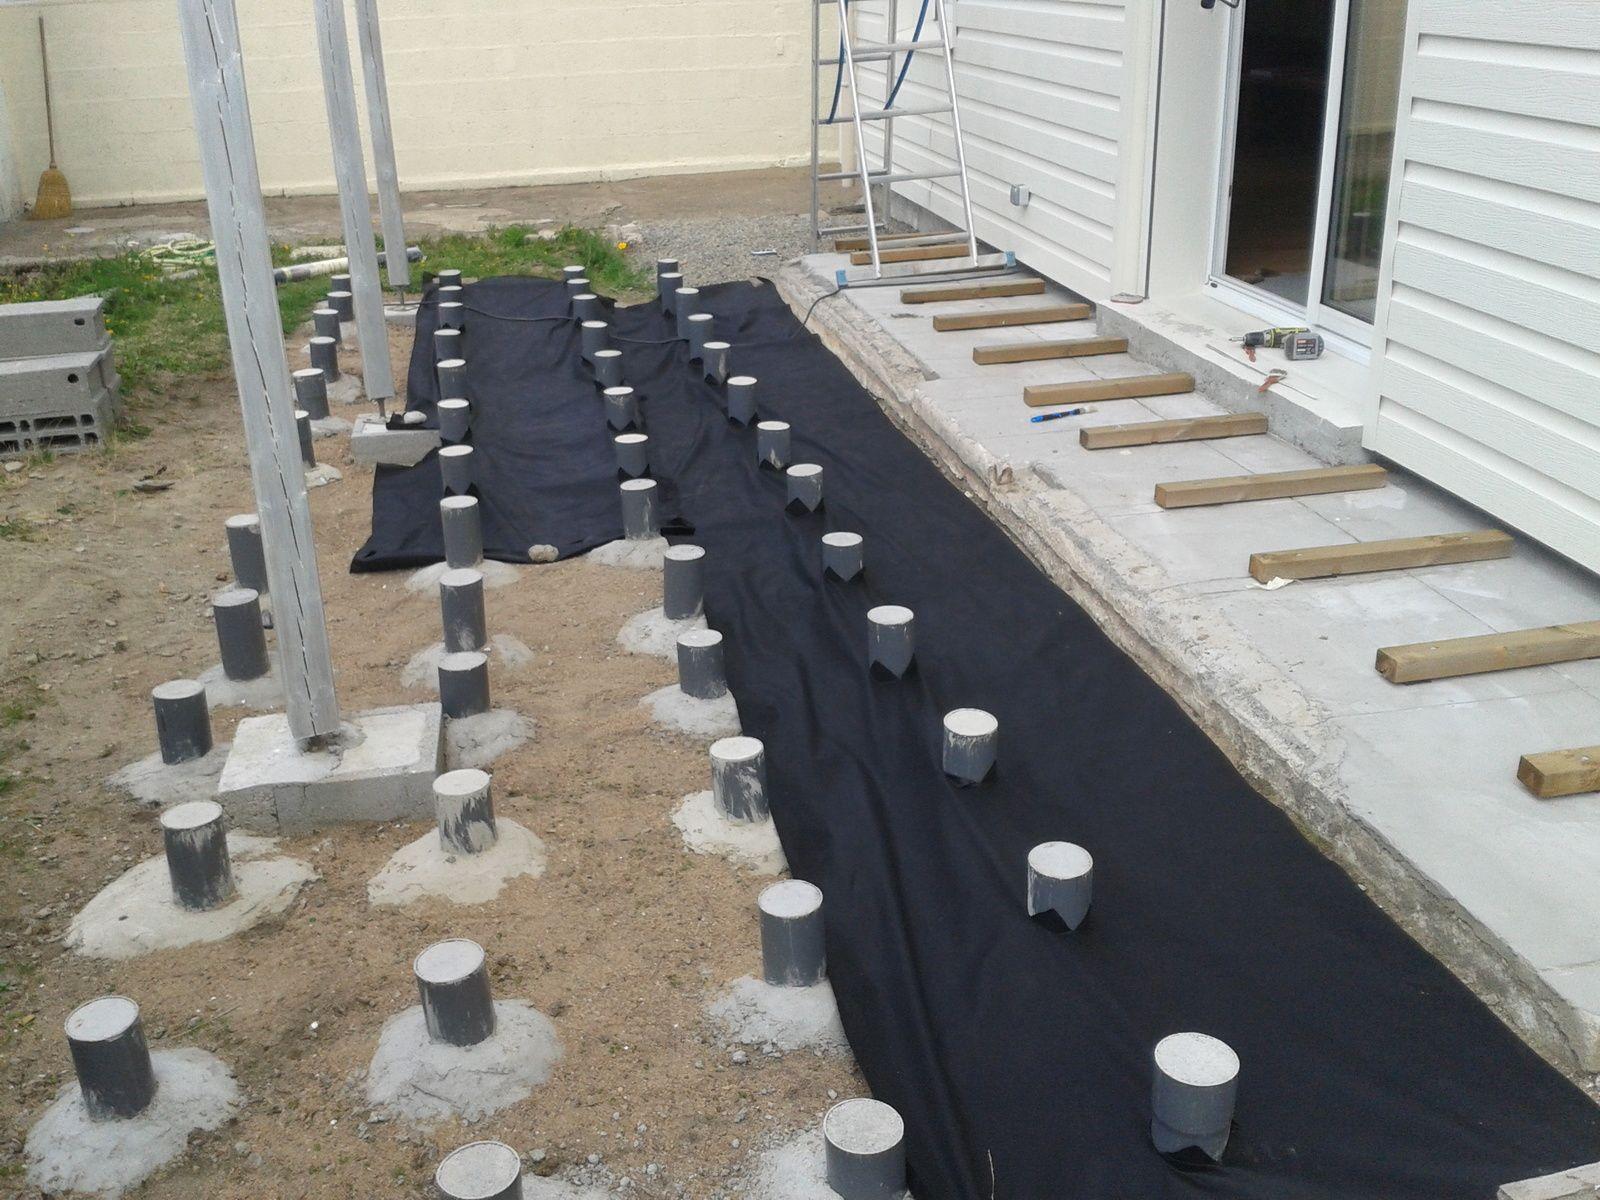 Plot Beton Terrasse Bois 6 Impressionnant Sur Plots 0